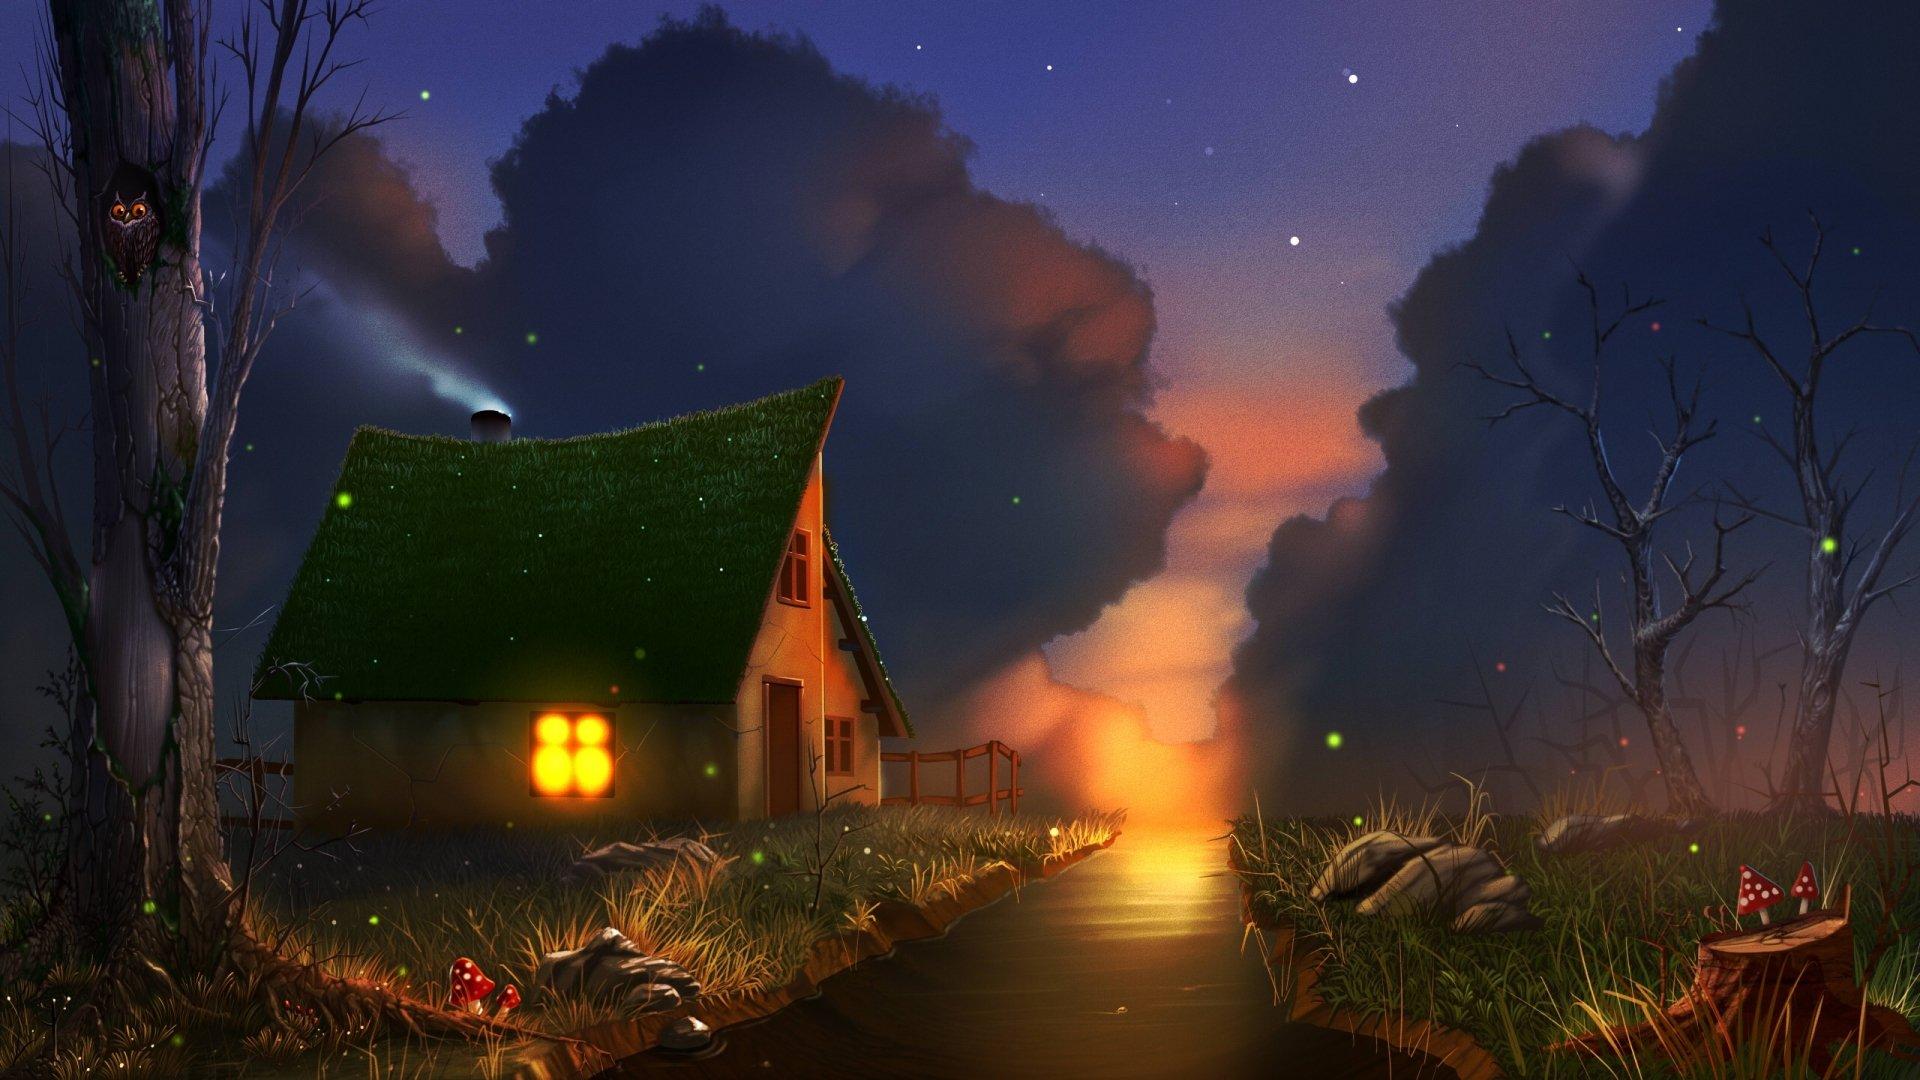 Fantasy - House  Cloud Night Stream Wallpaper